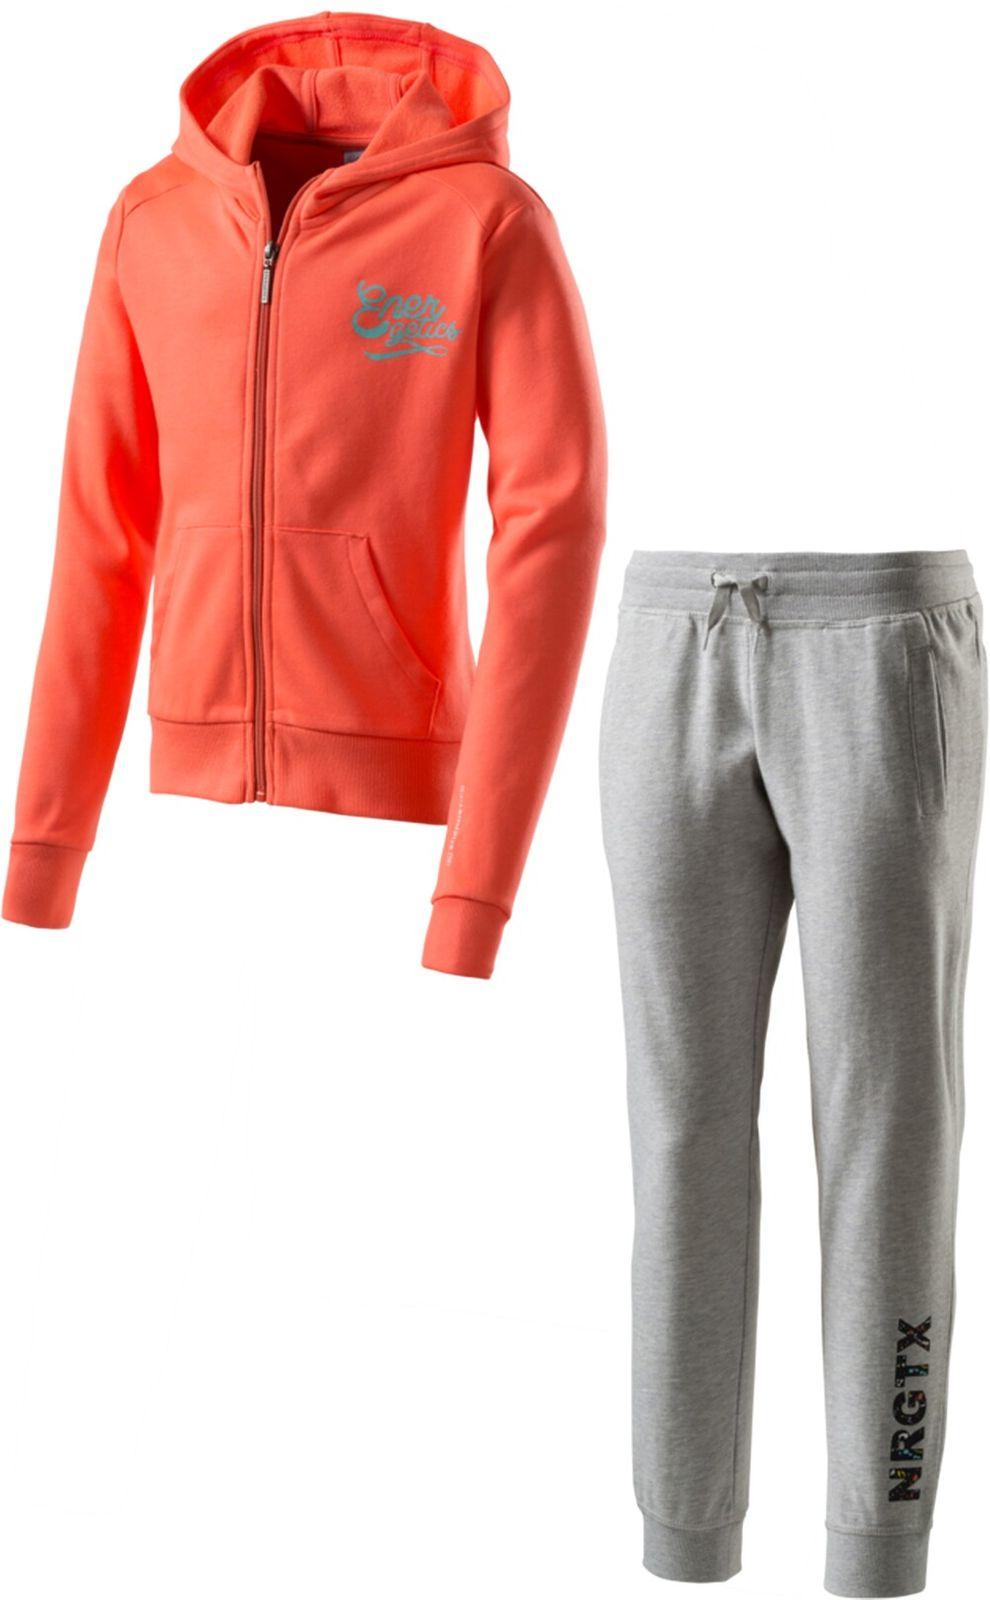 Details zu energetics Mädchen Fitness Trainingsanzug Sportanzug Susi + Svenja 7 rot grau